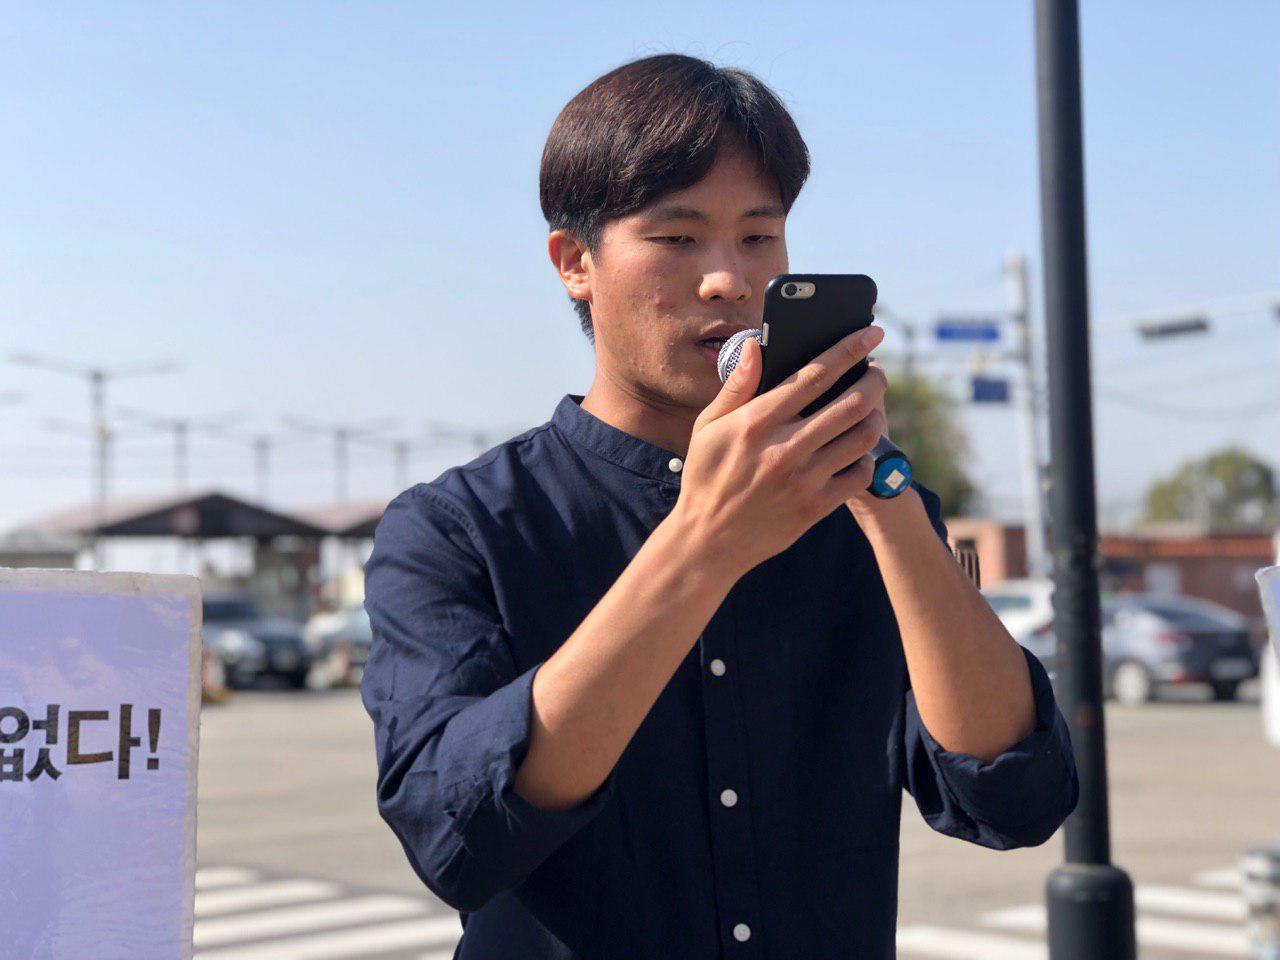 photo_2019-10-31_03-44-29.jpg